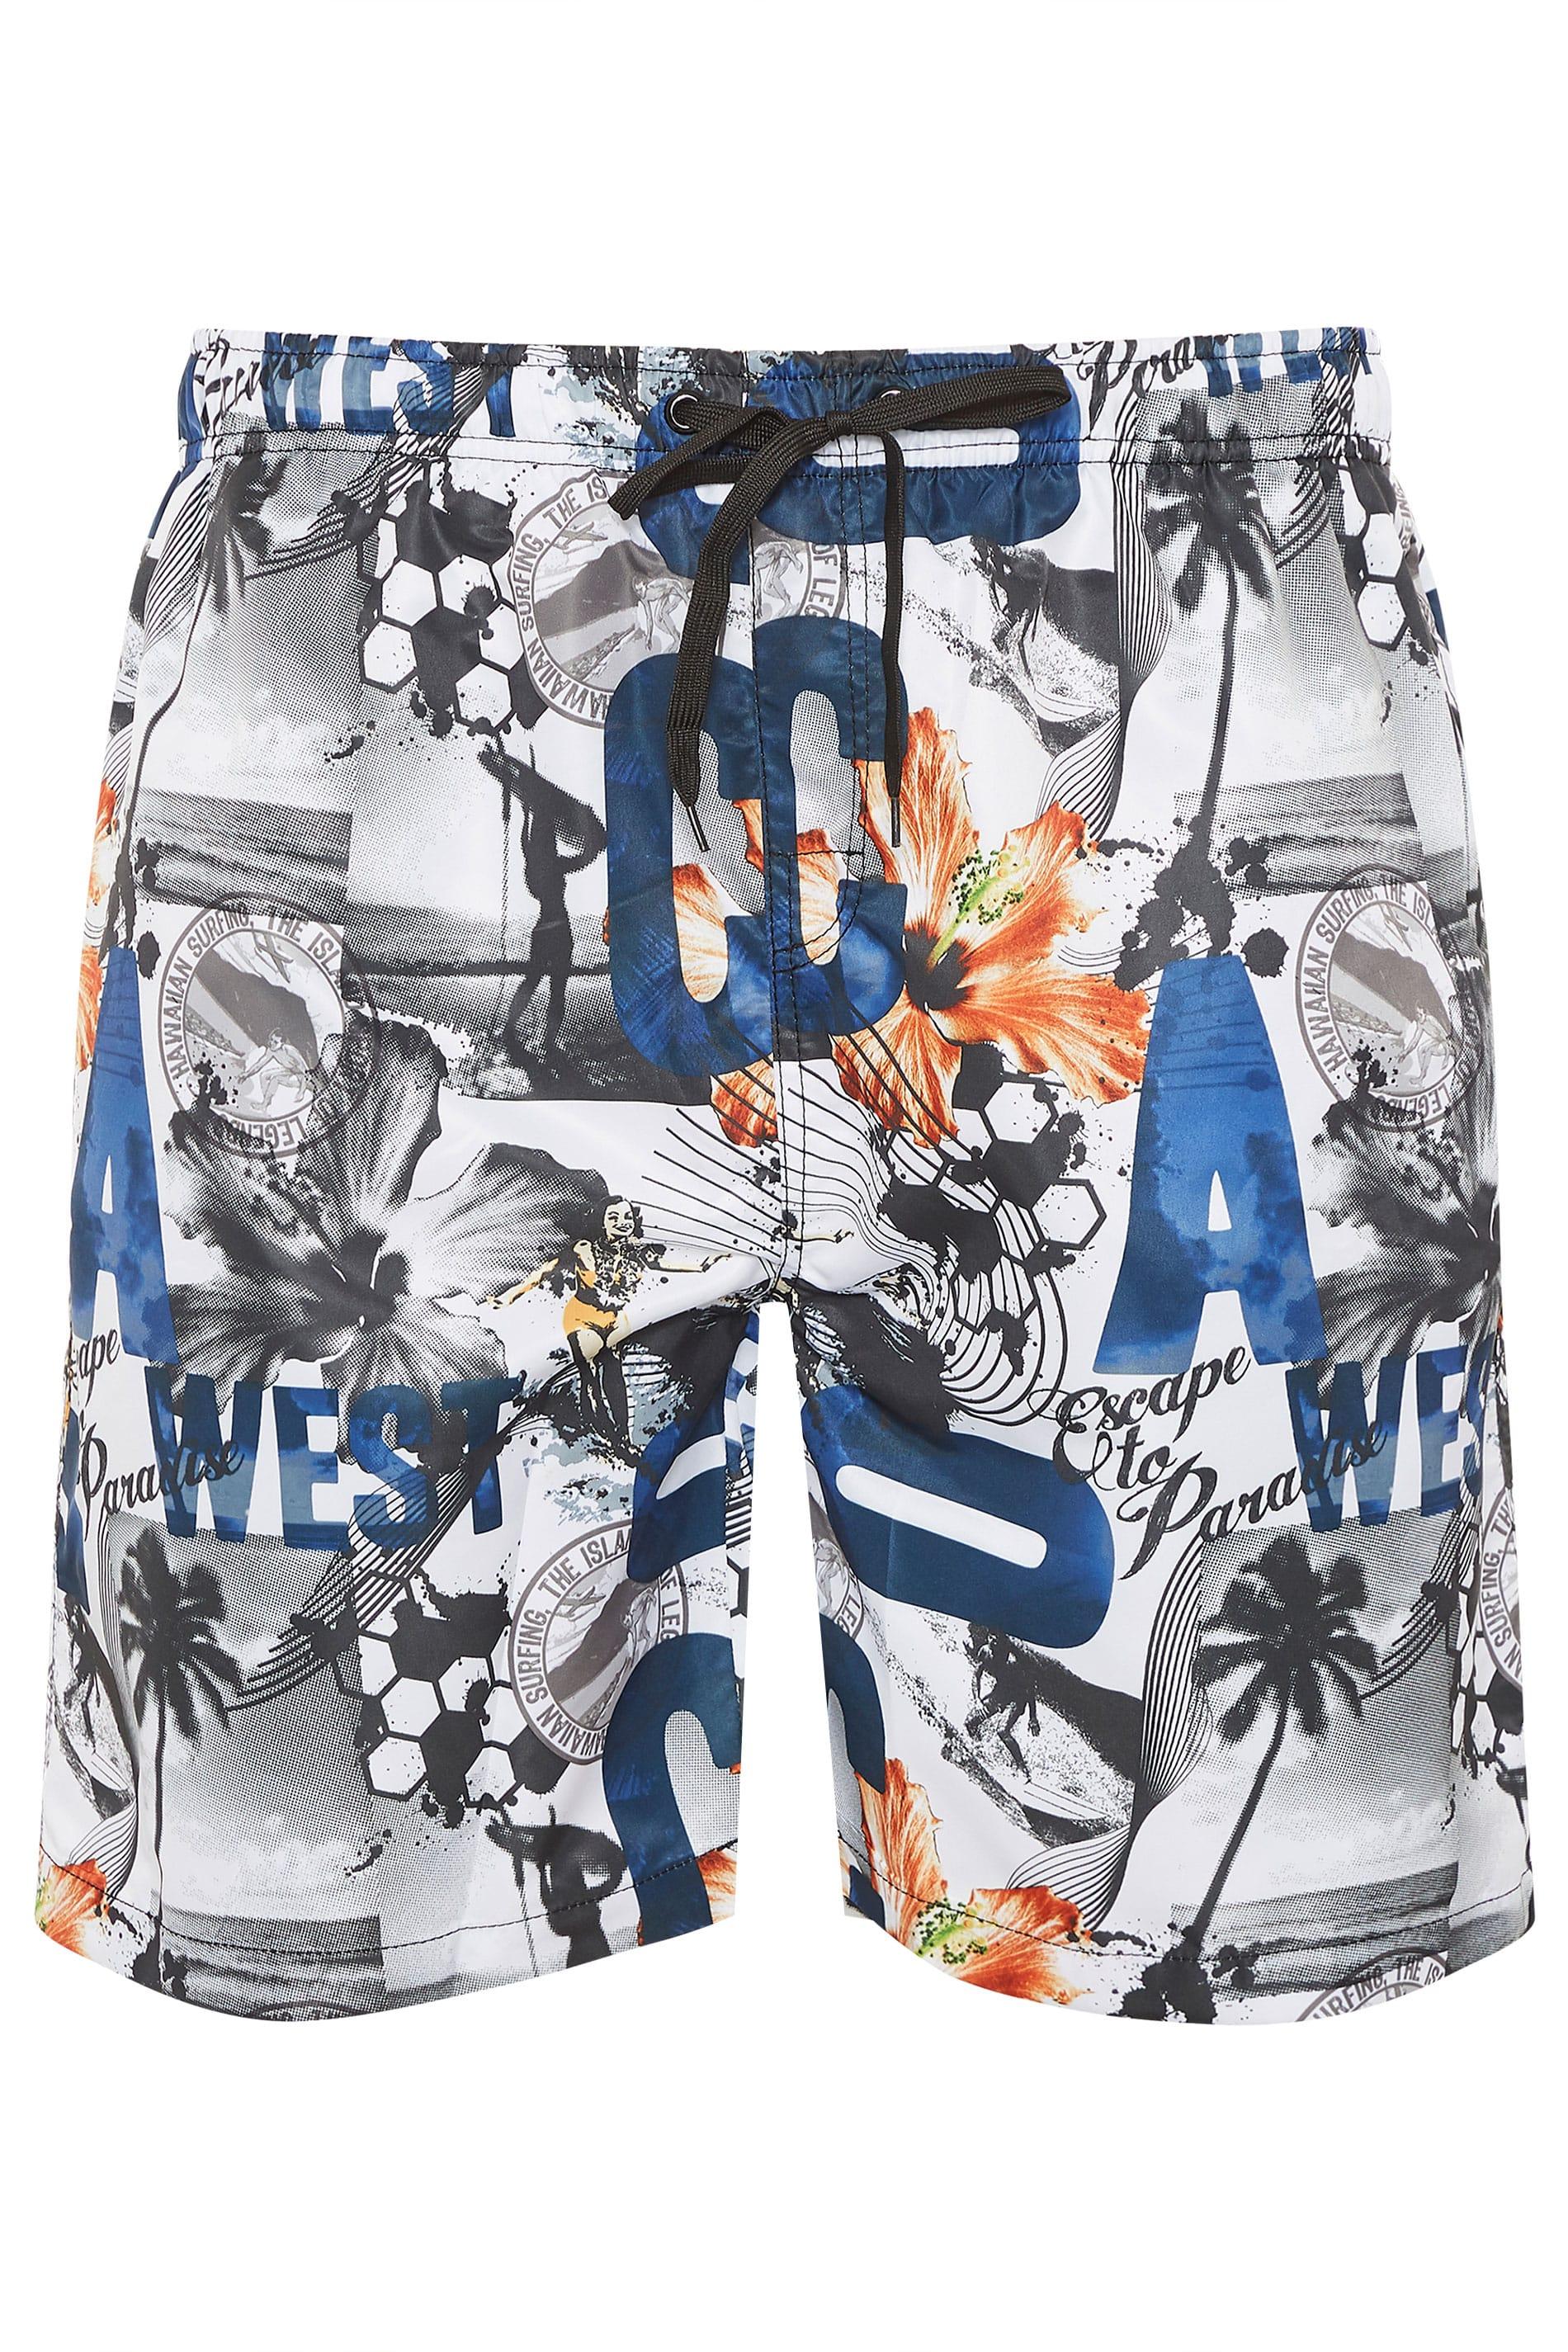 ED BAXTER Multi Printed Swim Shorts